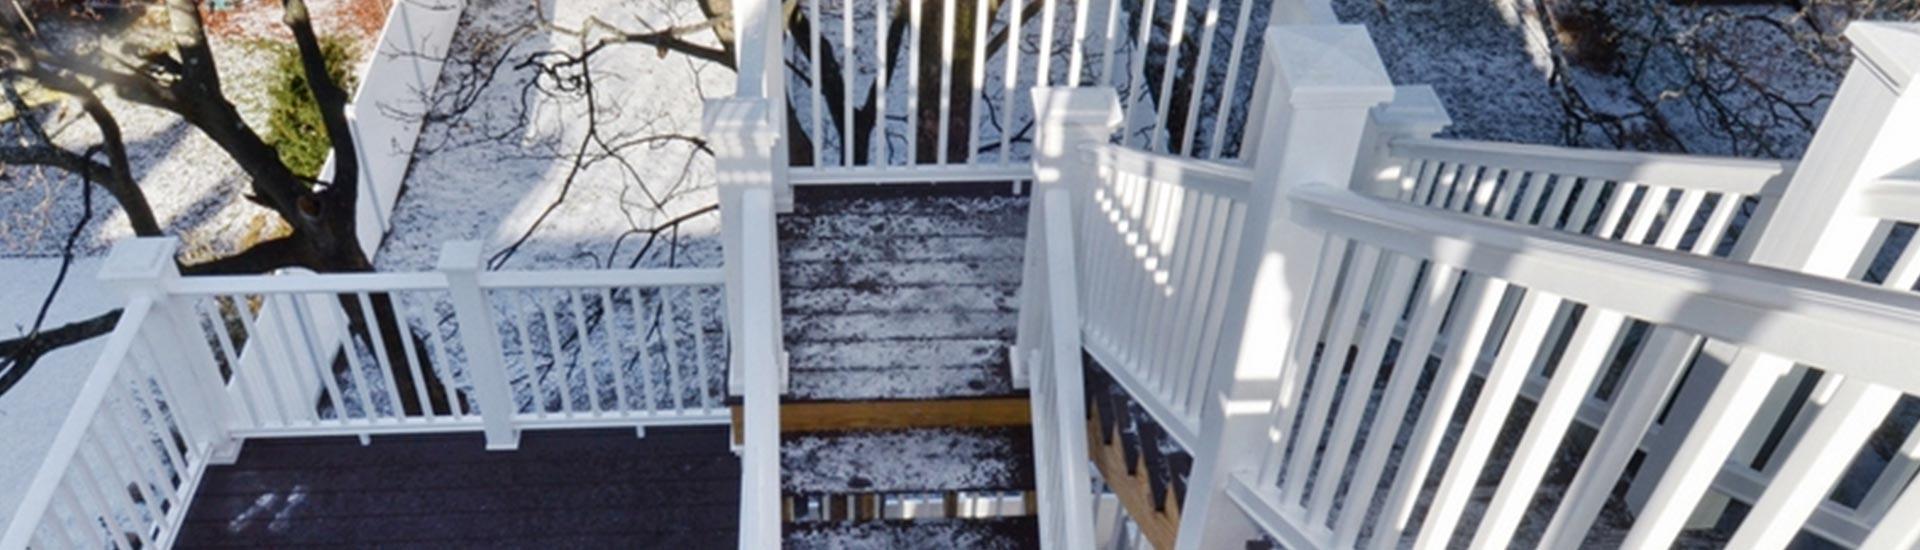 roof-deck-6